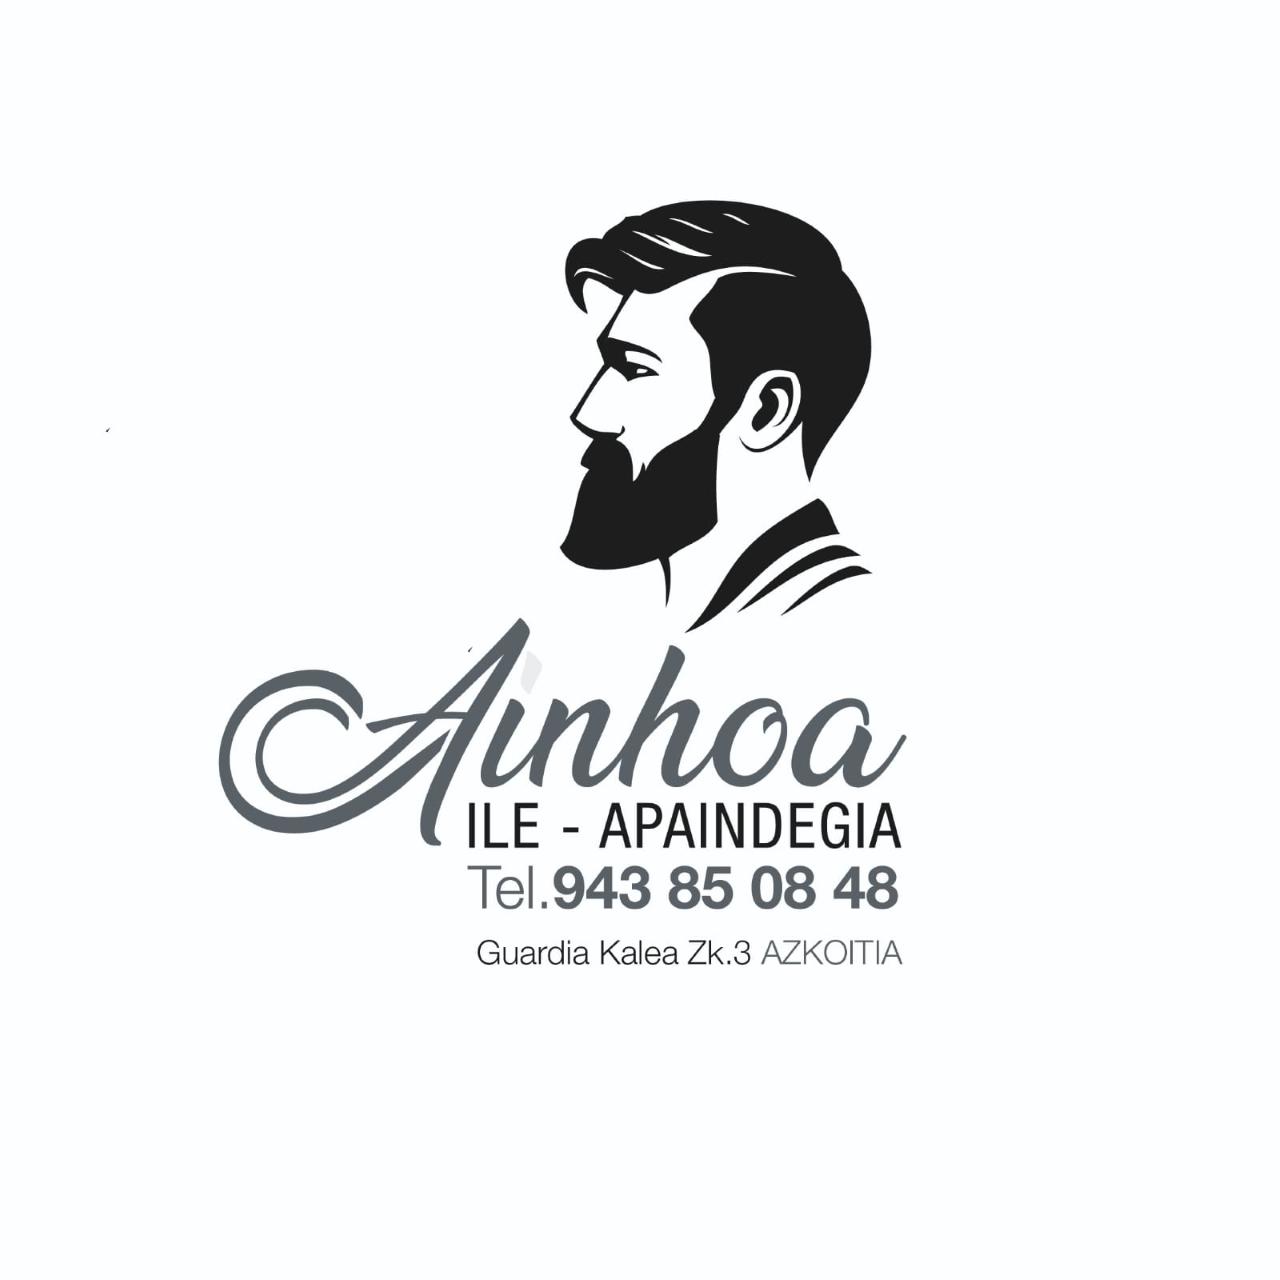 Ainhoa Ileapaindegia logoa